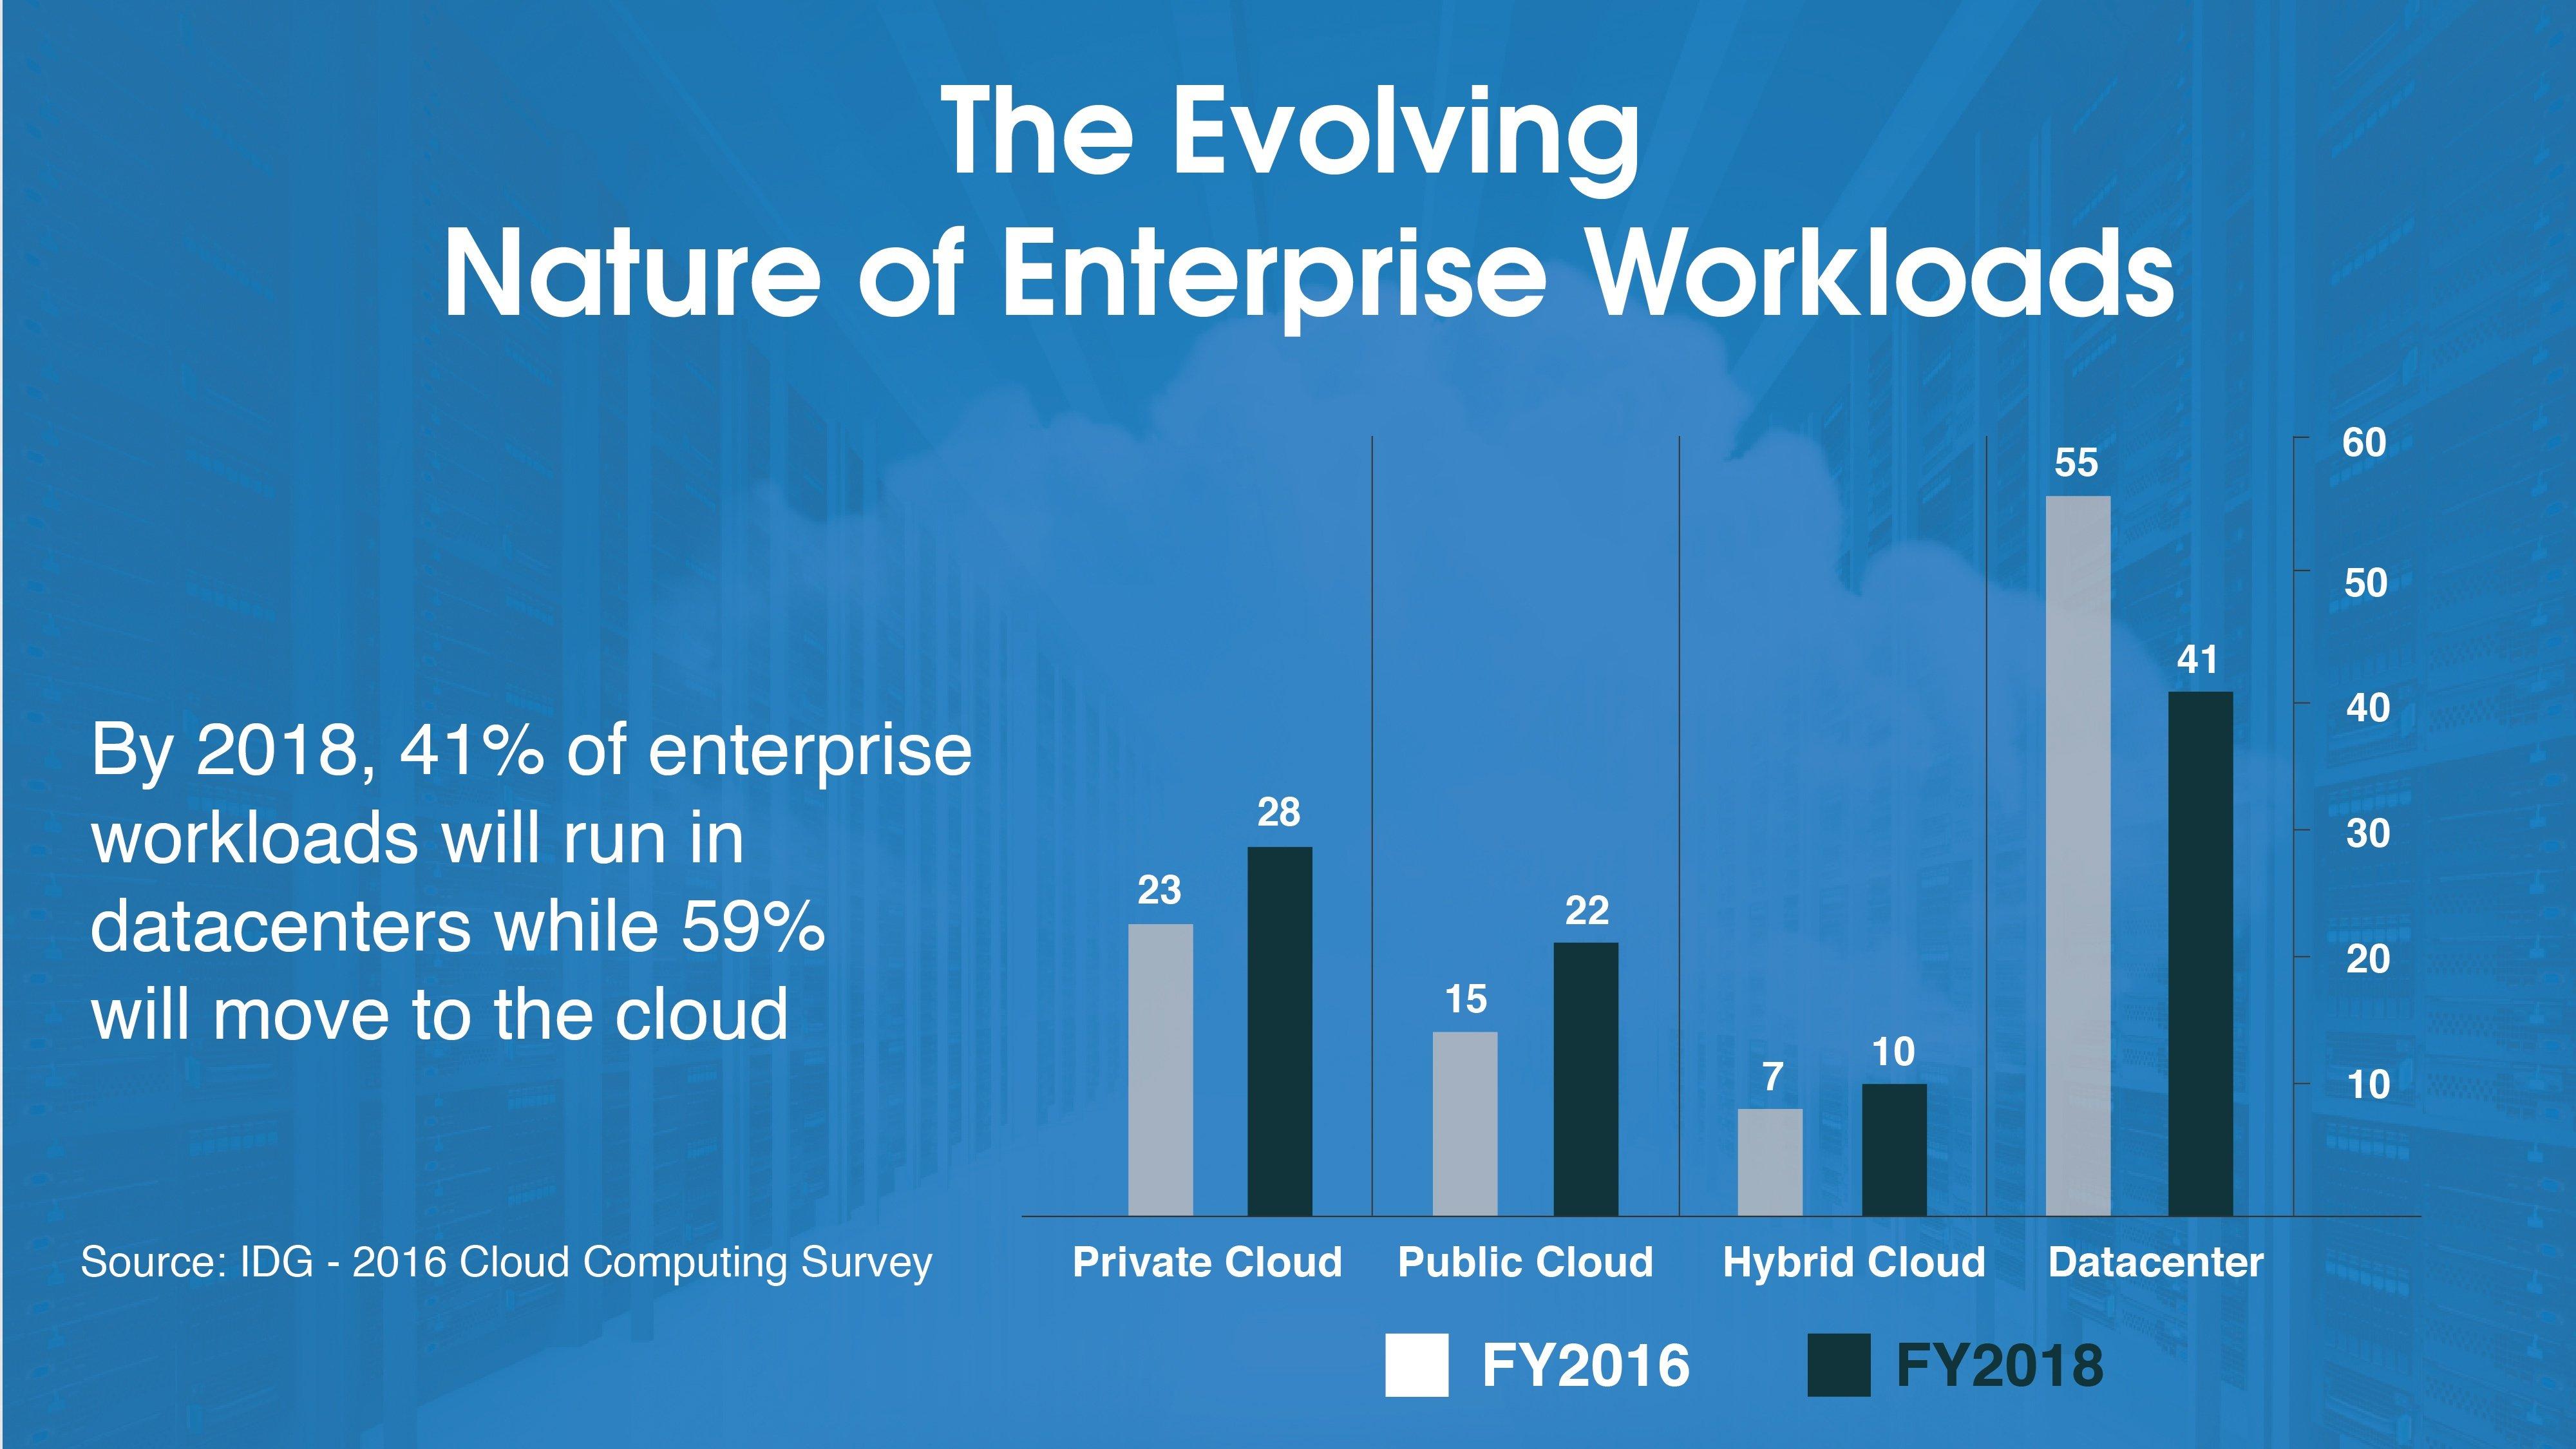 The Evolving Nature of Enterprise Workloads